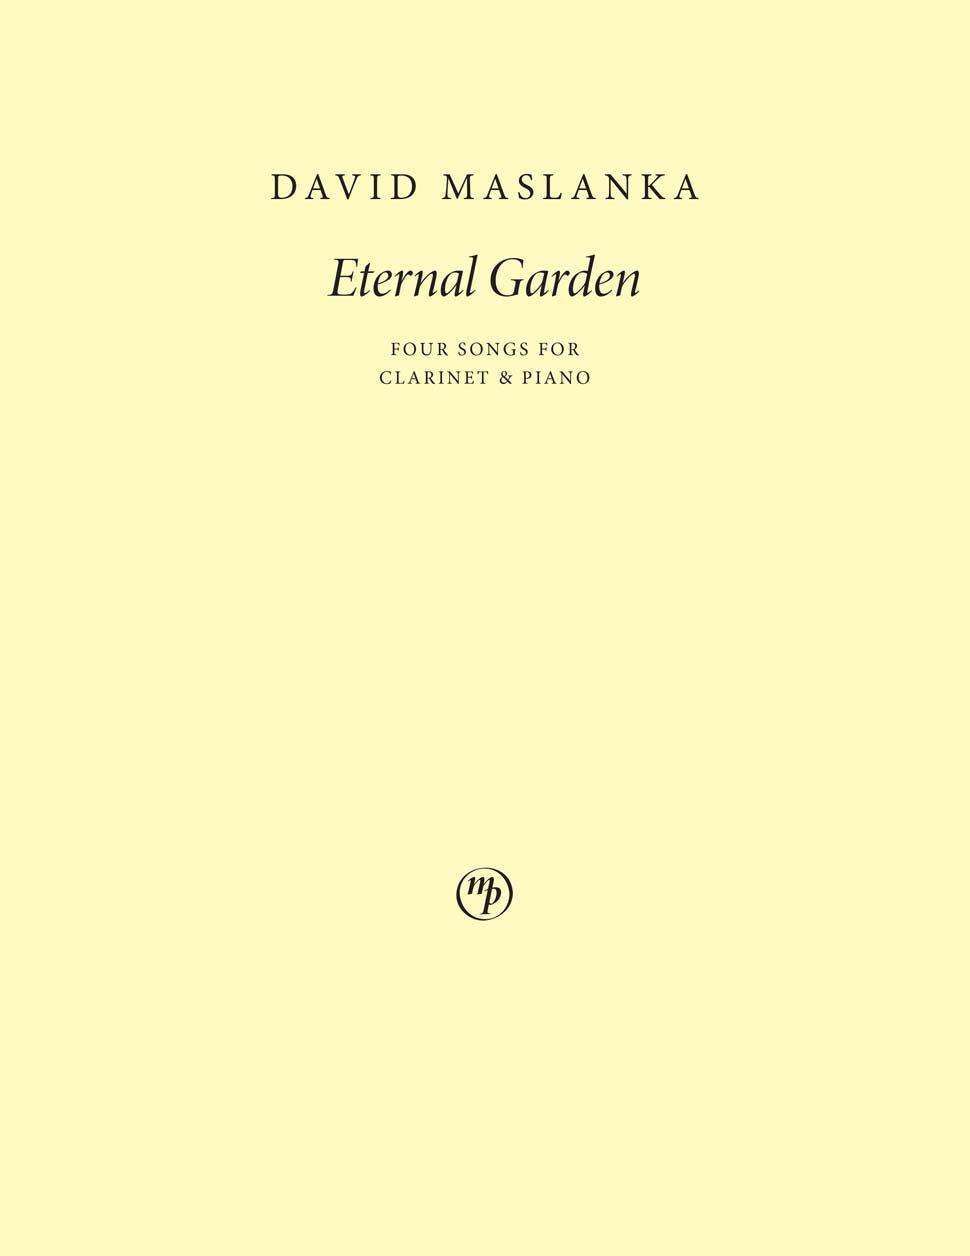 Maslanka, David: Eternal Garden - Fours Songs for Clarinet & Piano